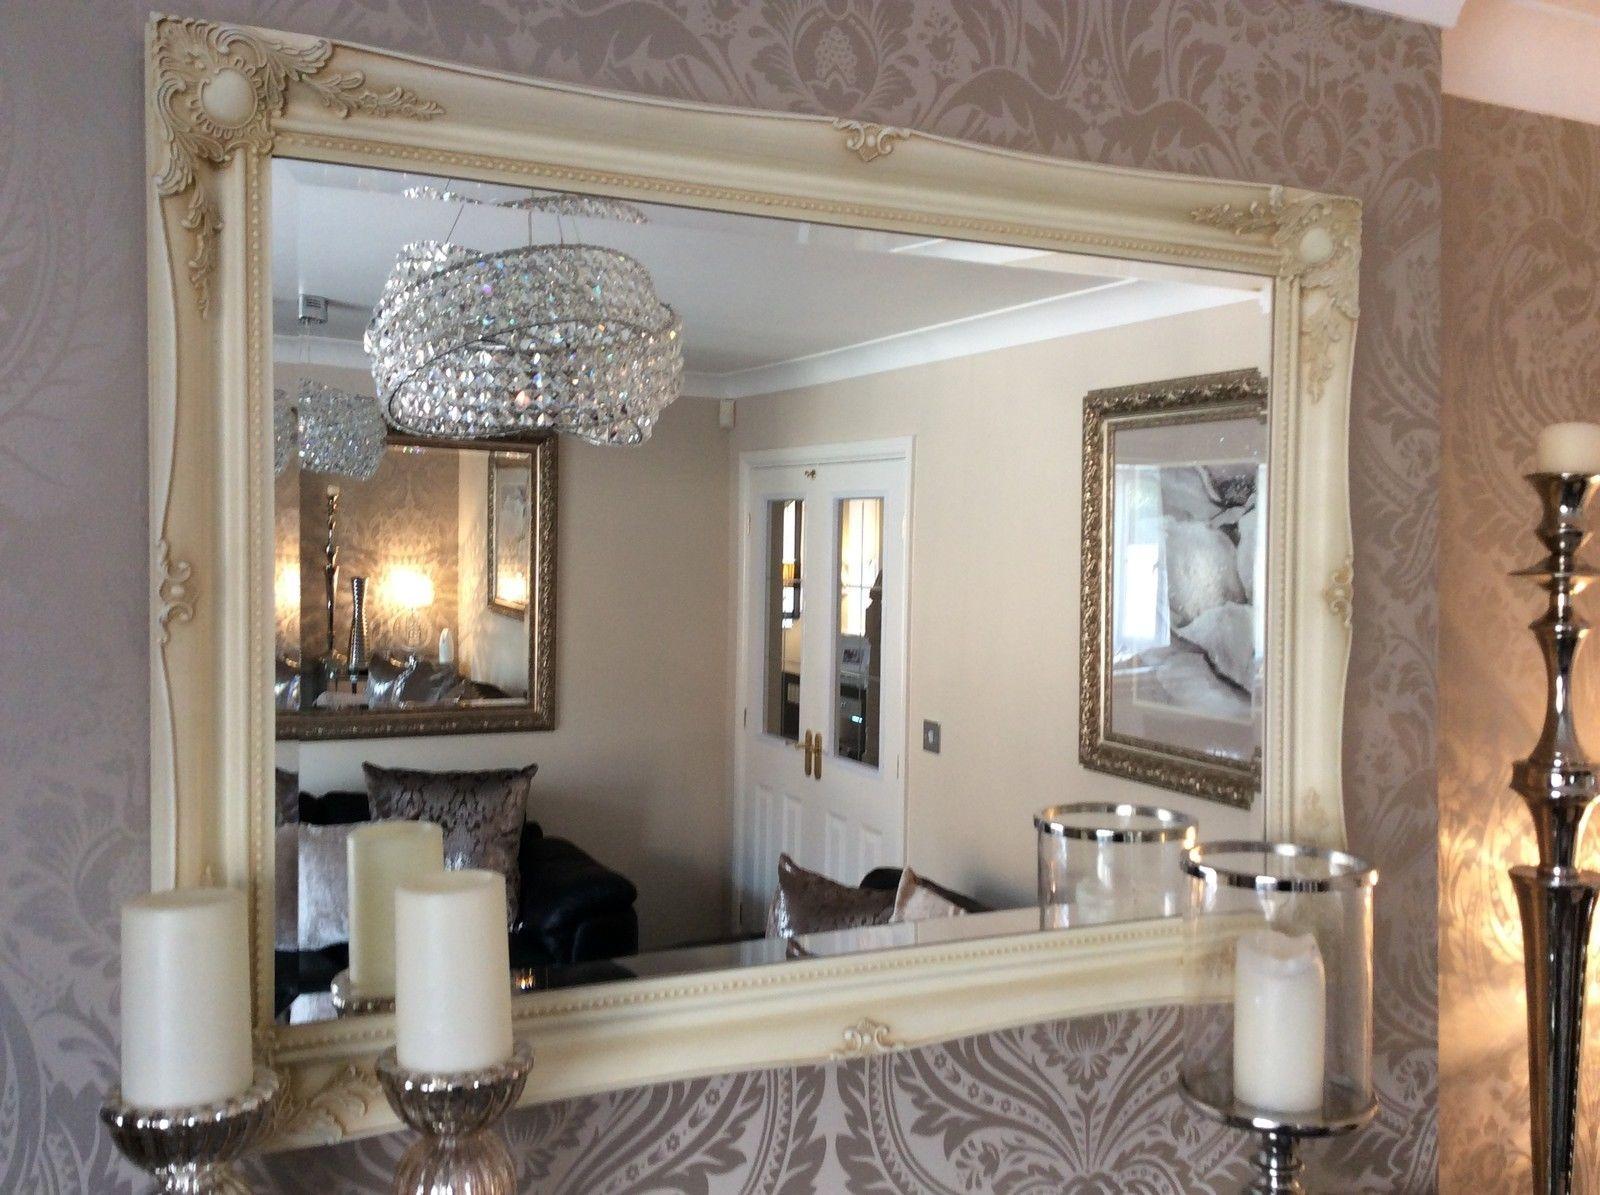 Fabulous Large Cream Decorative Stunning Shab Chic Wall Mirror Regarding Shabby Chic Cream Mirror (Image 1 of 15)